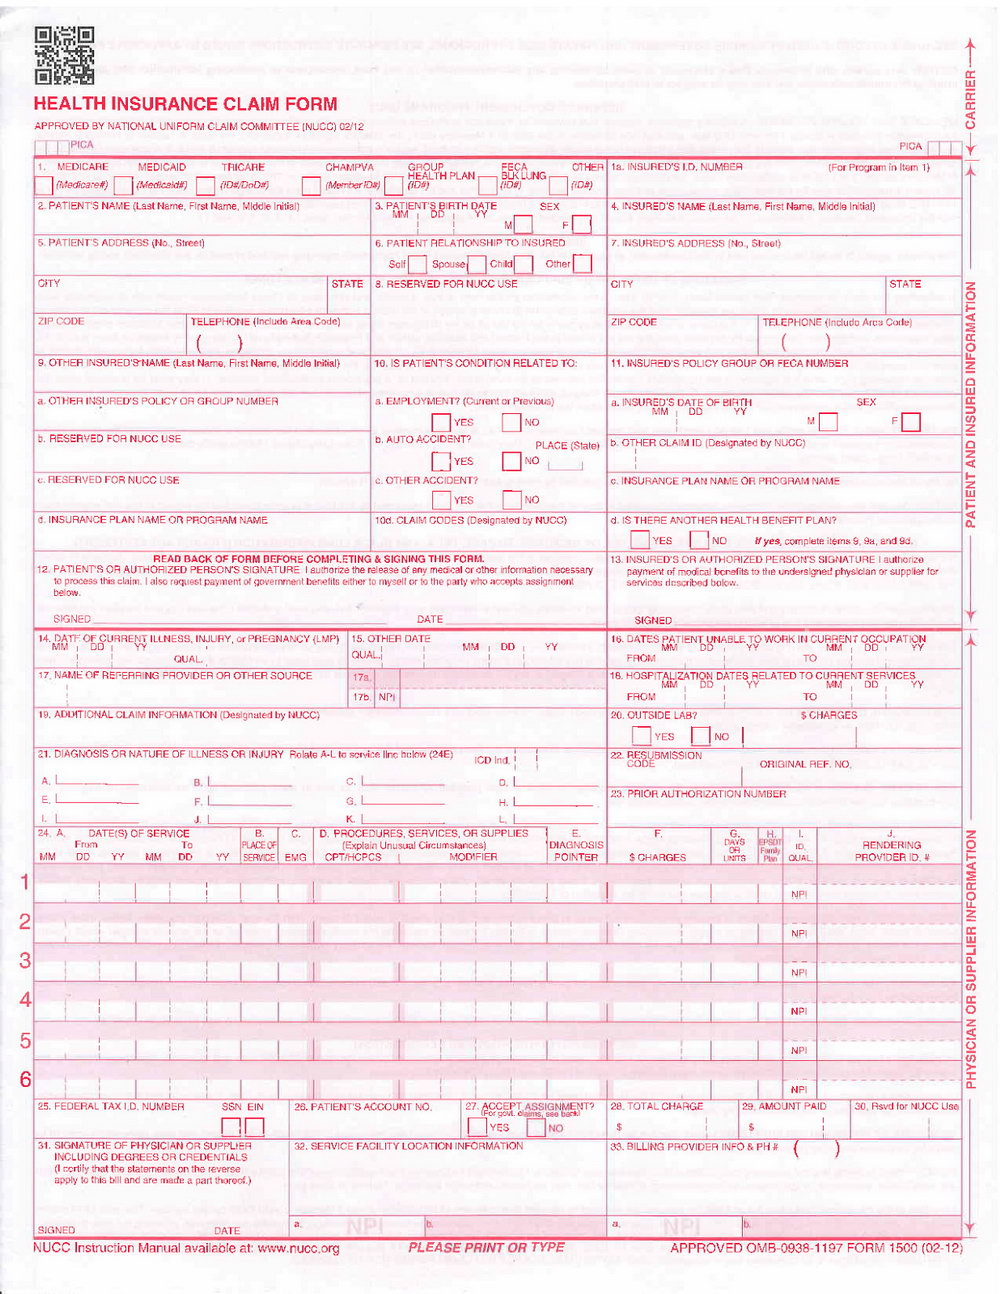 Hcfa Claim Form